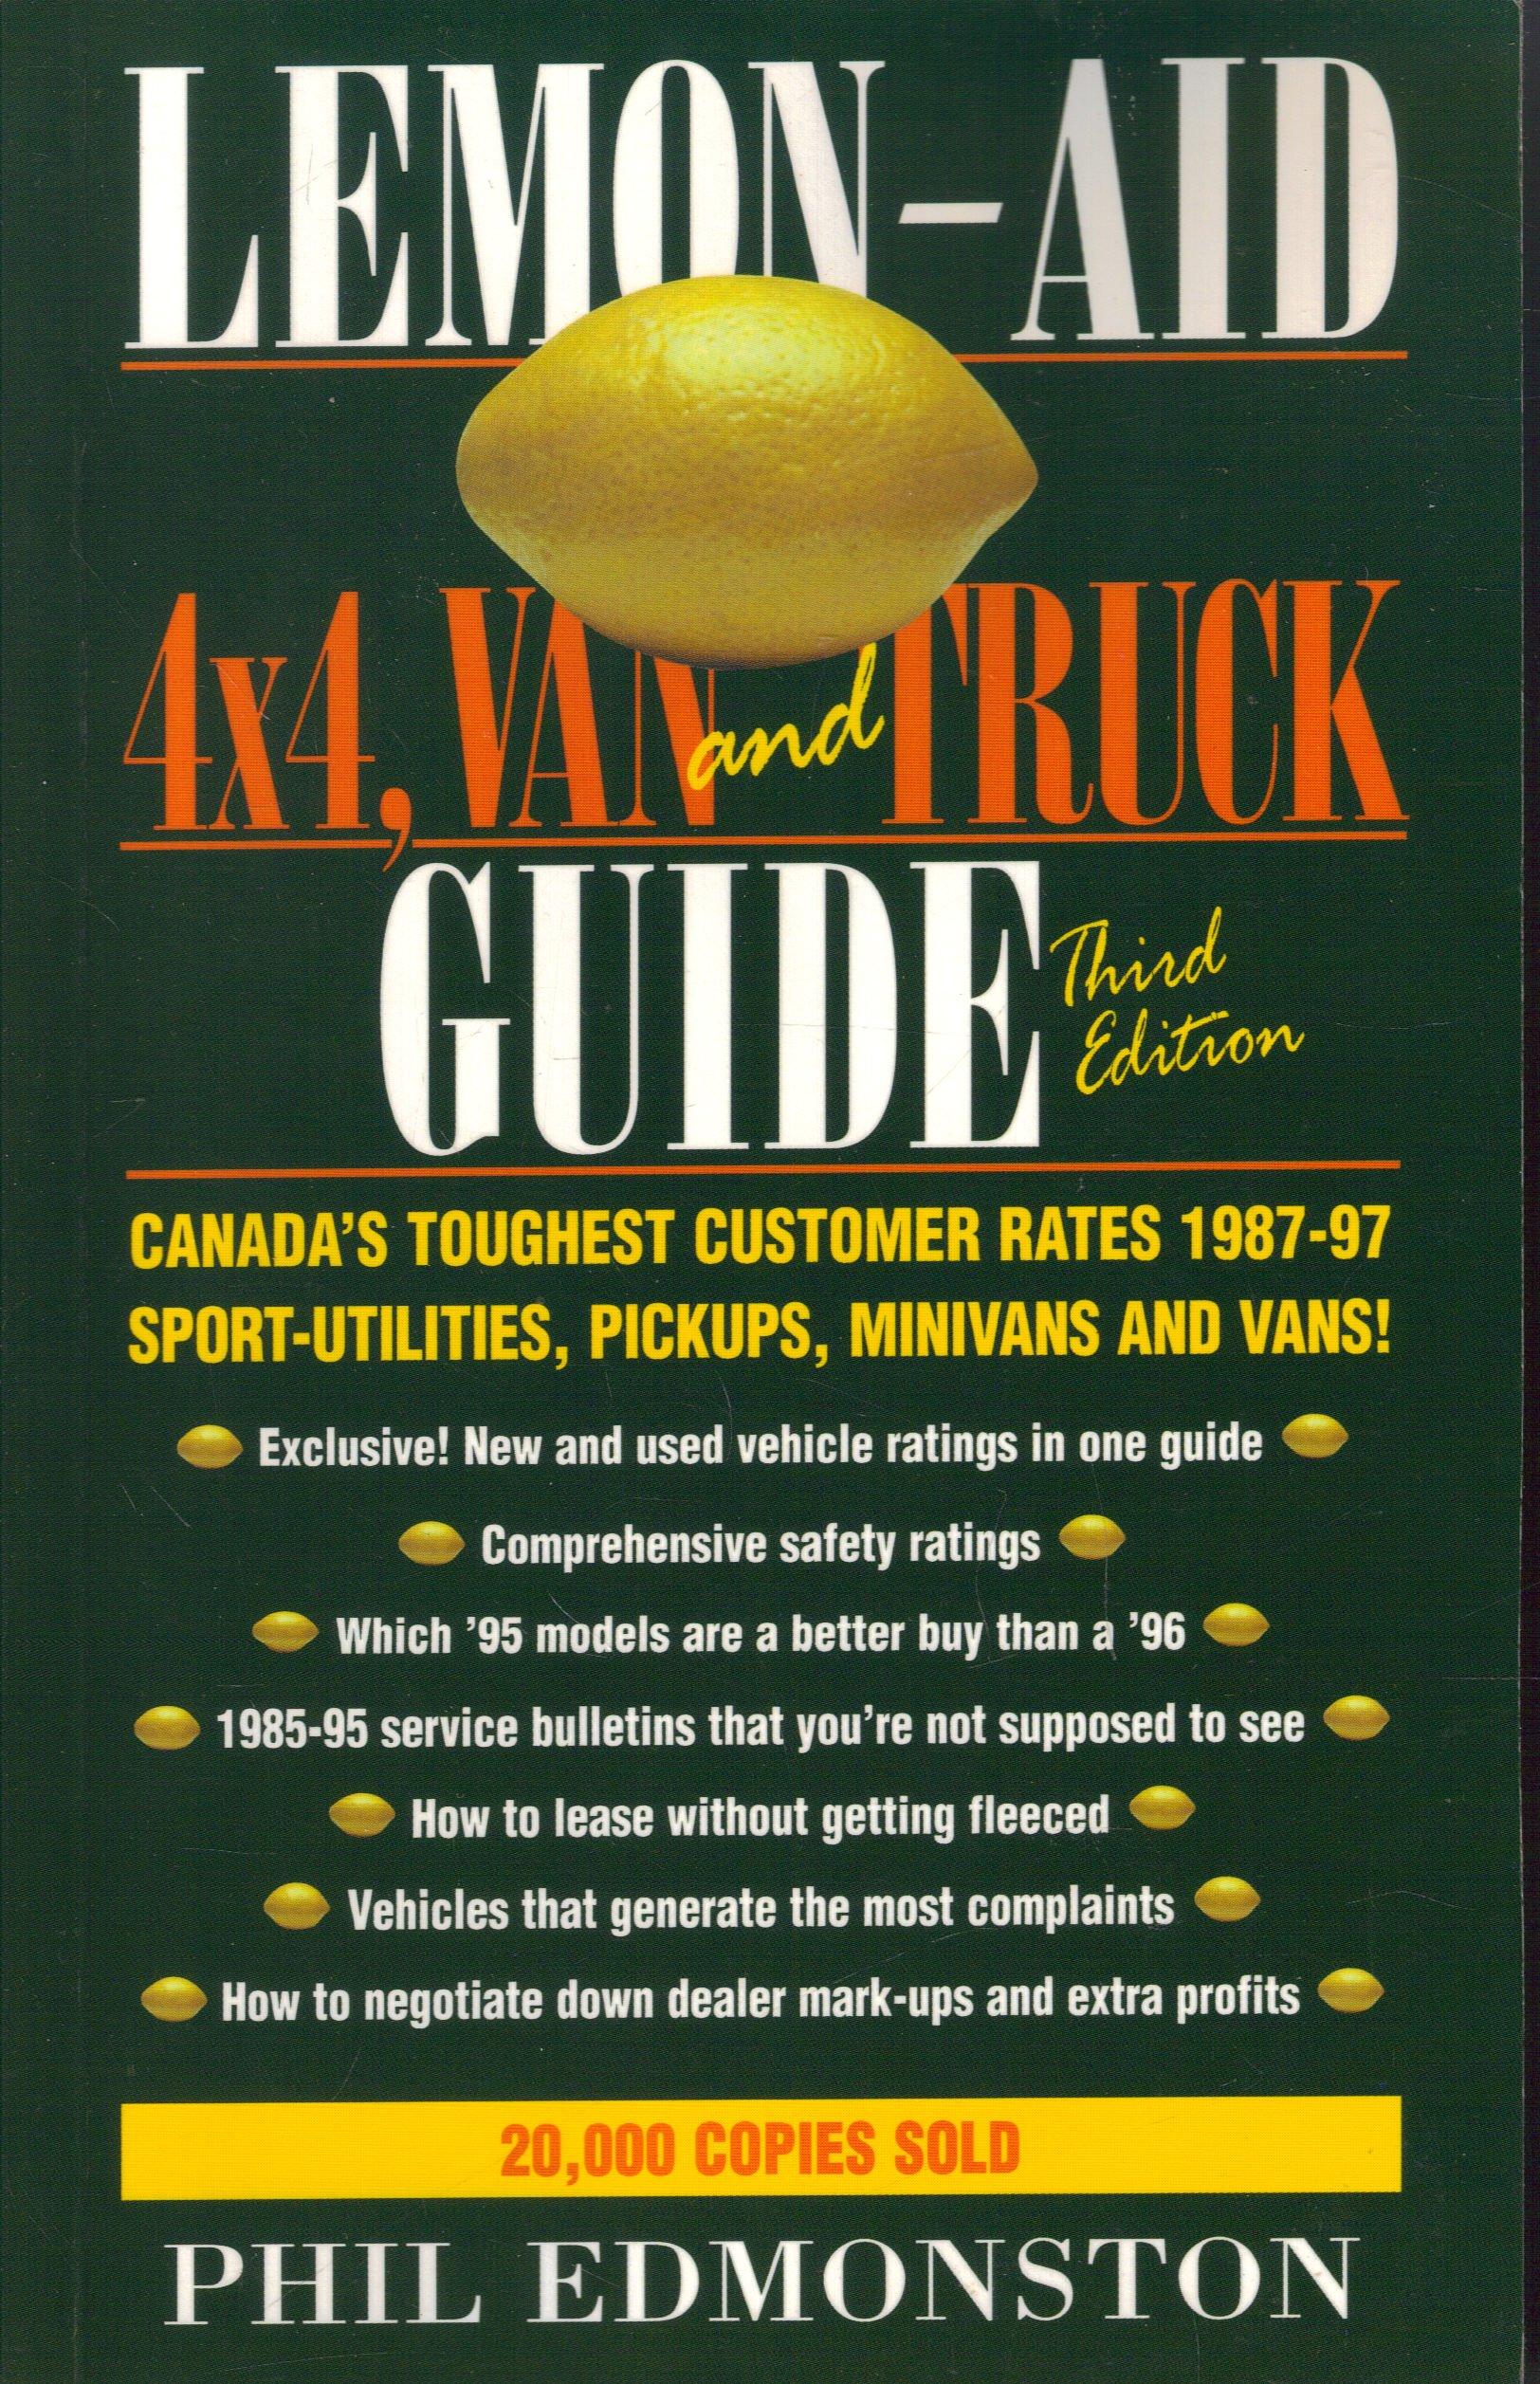 Lemon-Aid 4X4 Van and Truck Guide: Phil Edmonston: 9780773757998 ...